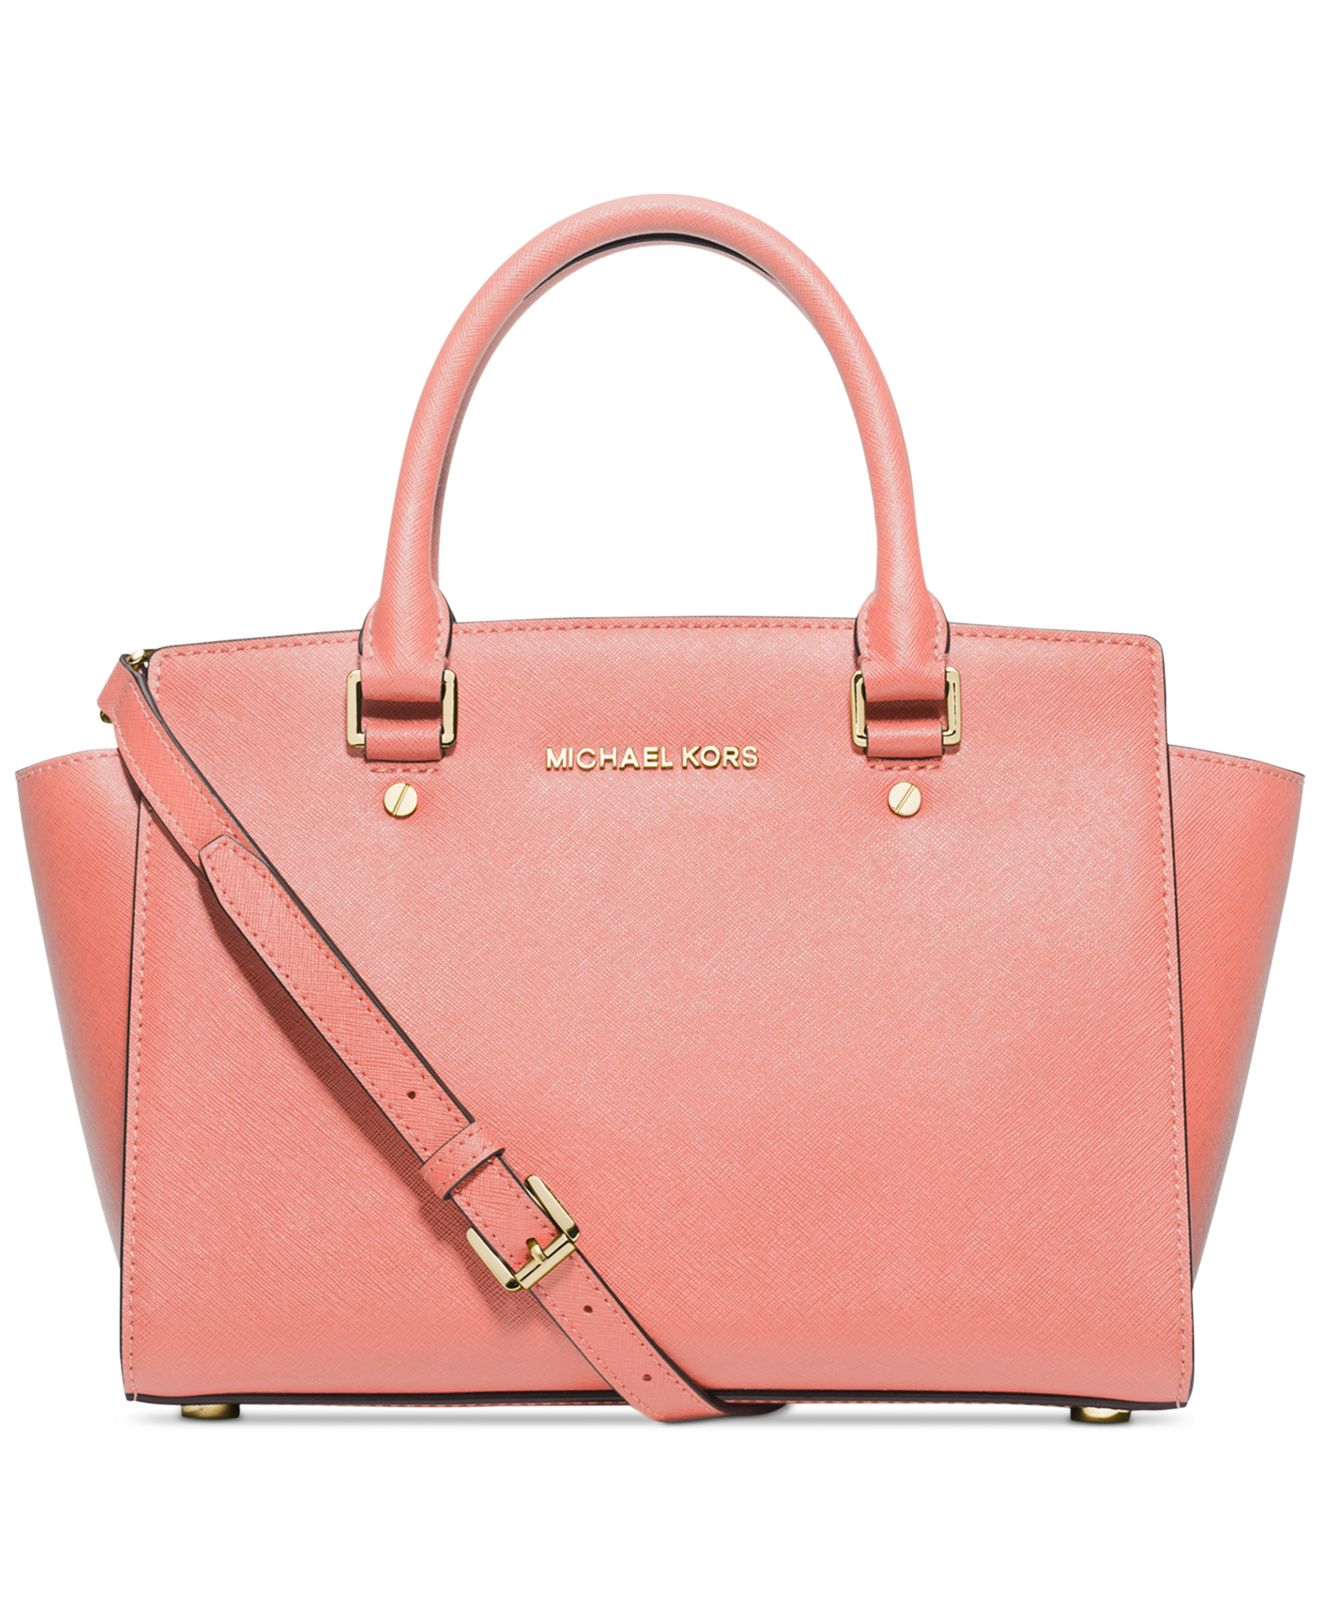 michael kors michael selma medium satchel in pink lyst. Black Bedroom Furniture Sets. Home Design Ideas